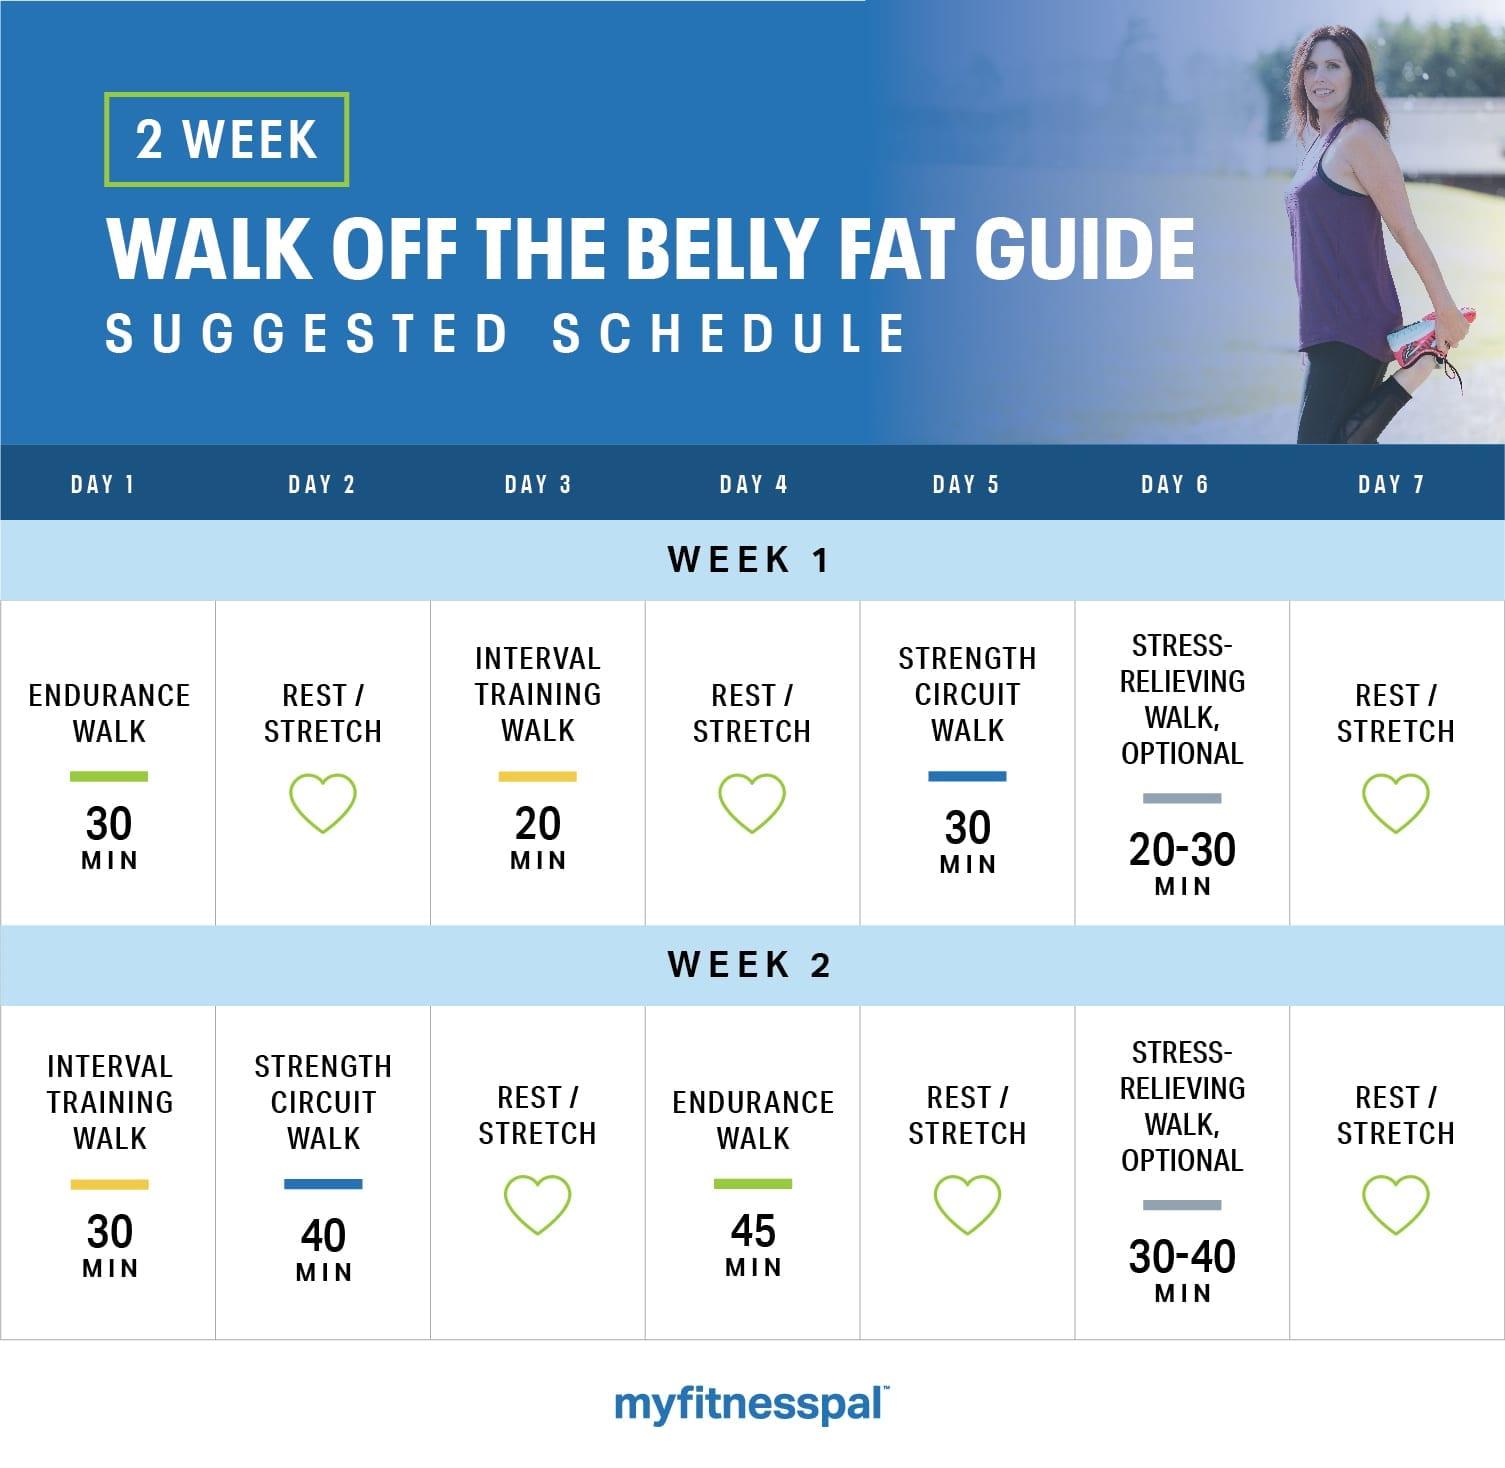 2-Week Walk Off the Belly Fat Guide